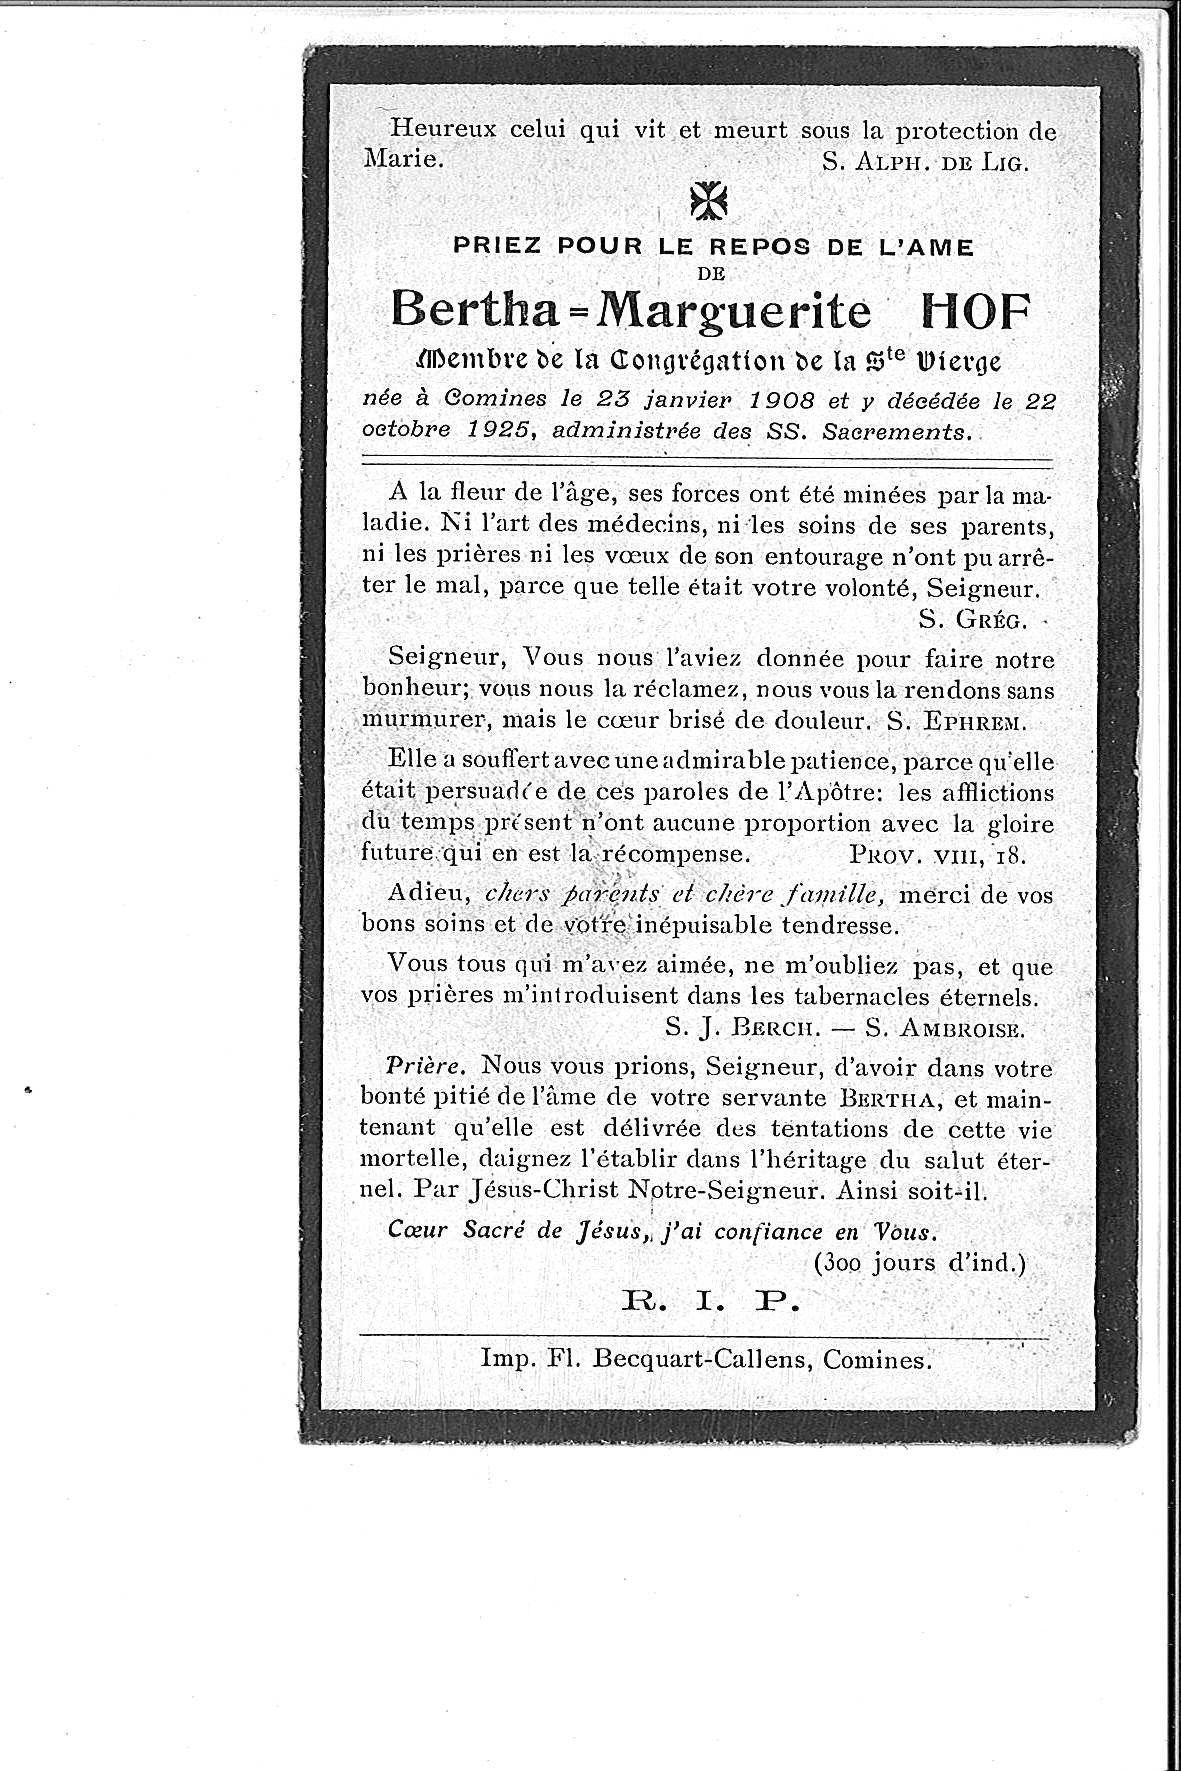 Bertha-Marguerite(1925)20151002161158_00015.jpg